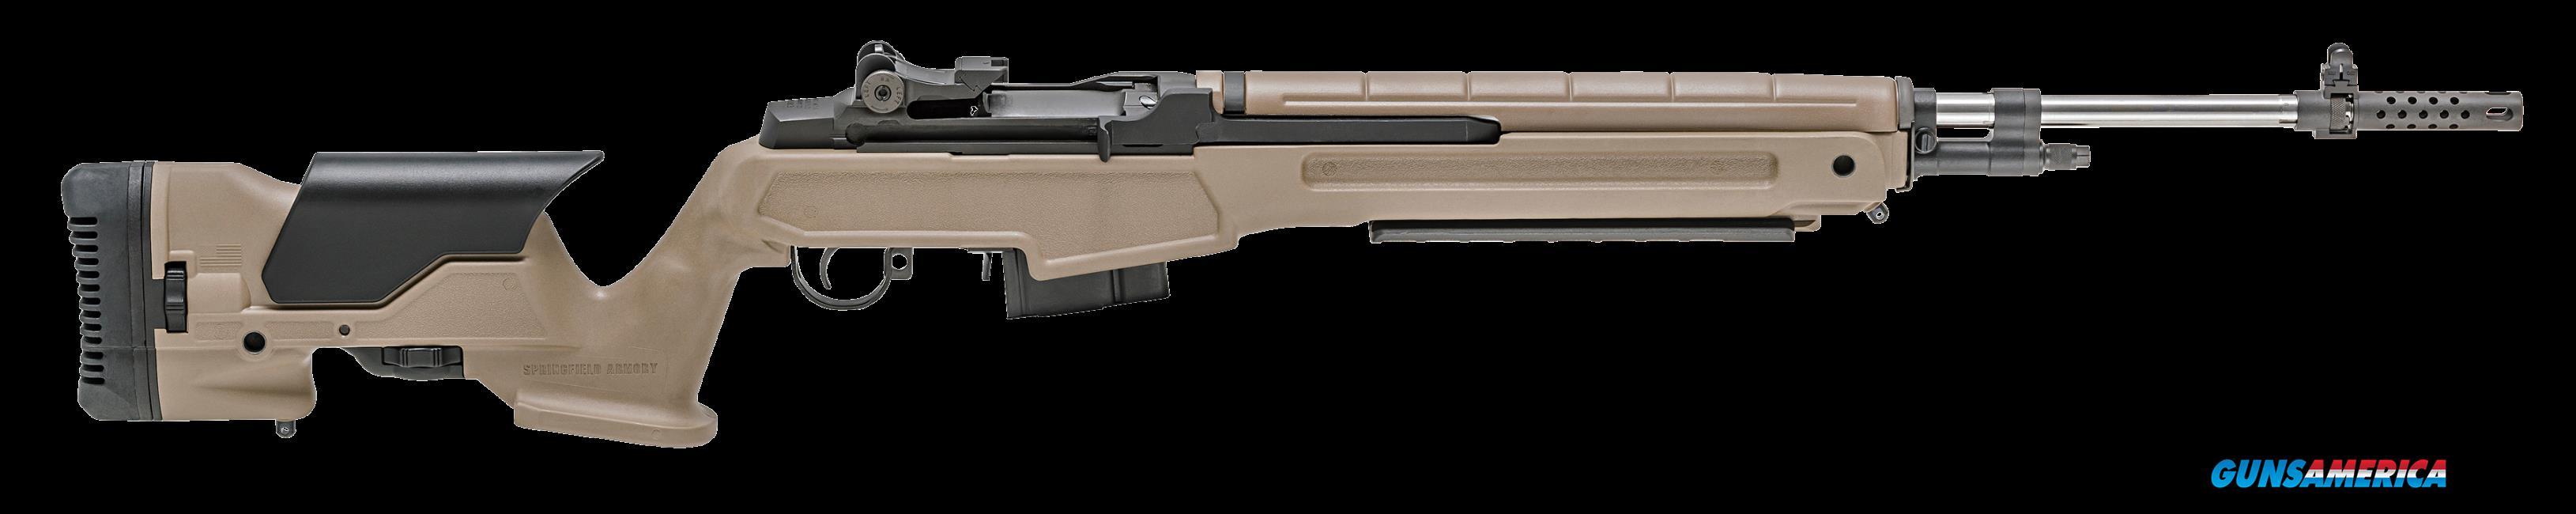 Springfield Armory M1a, Spg Mp9820c65   6.5cr  Precision    Fde  Guns > Pistols > 1911 Pistol Copies (non-Colt)